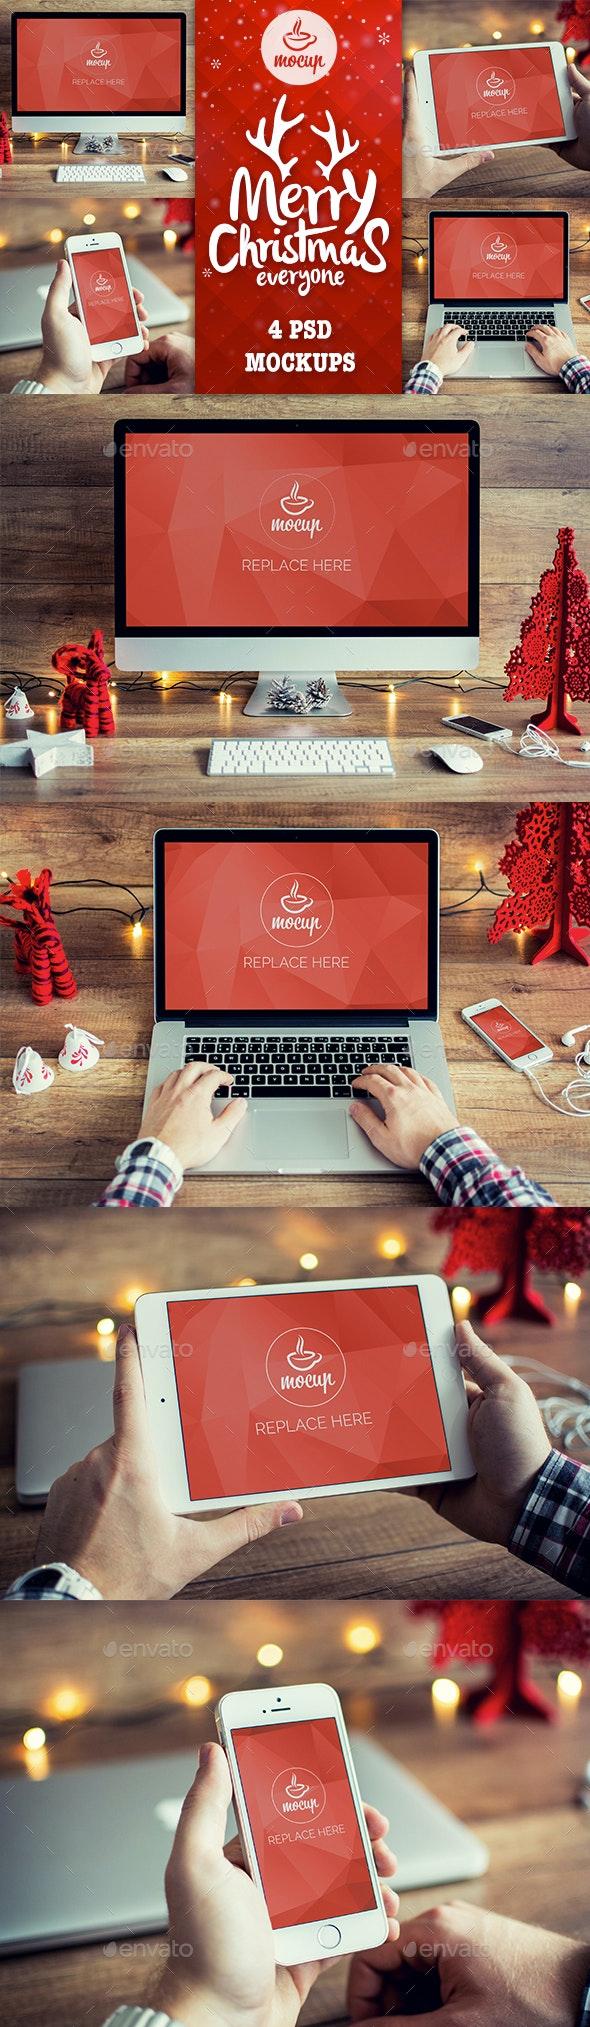 4 PSD Christmas Mockups - iMac, Macbook, iPad, iPhone - Displays Product Mock-Ups